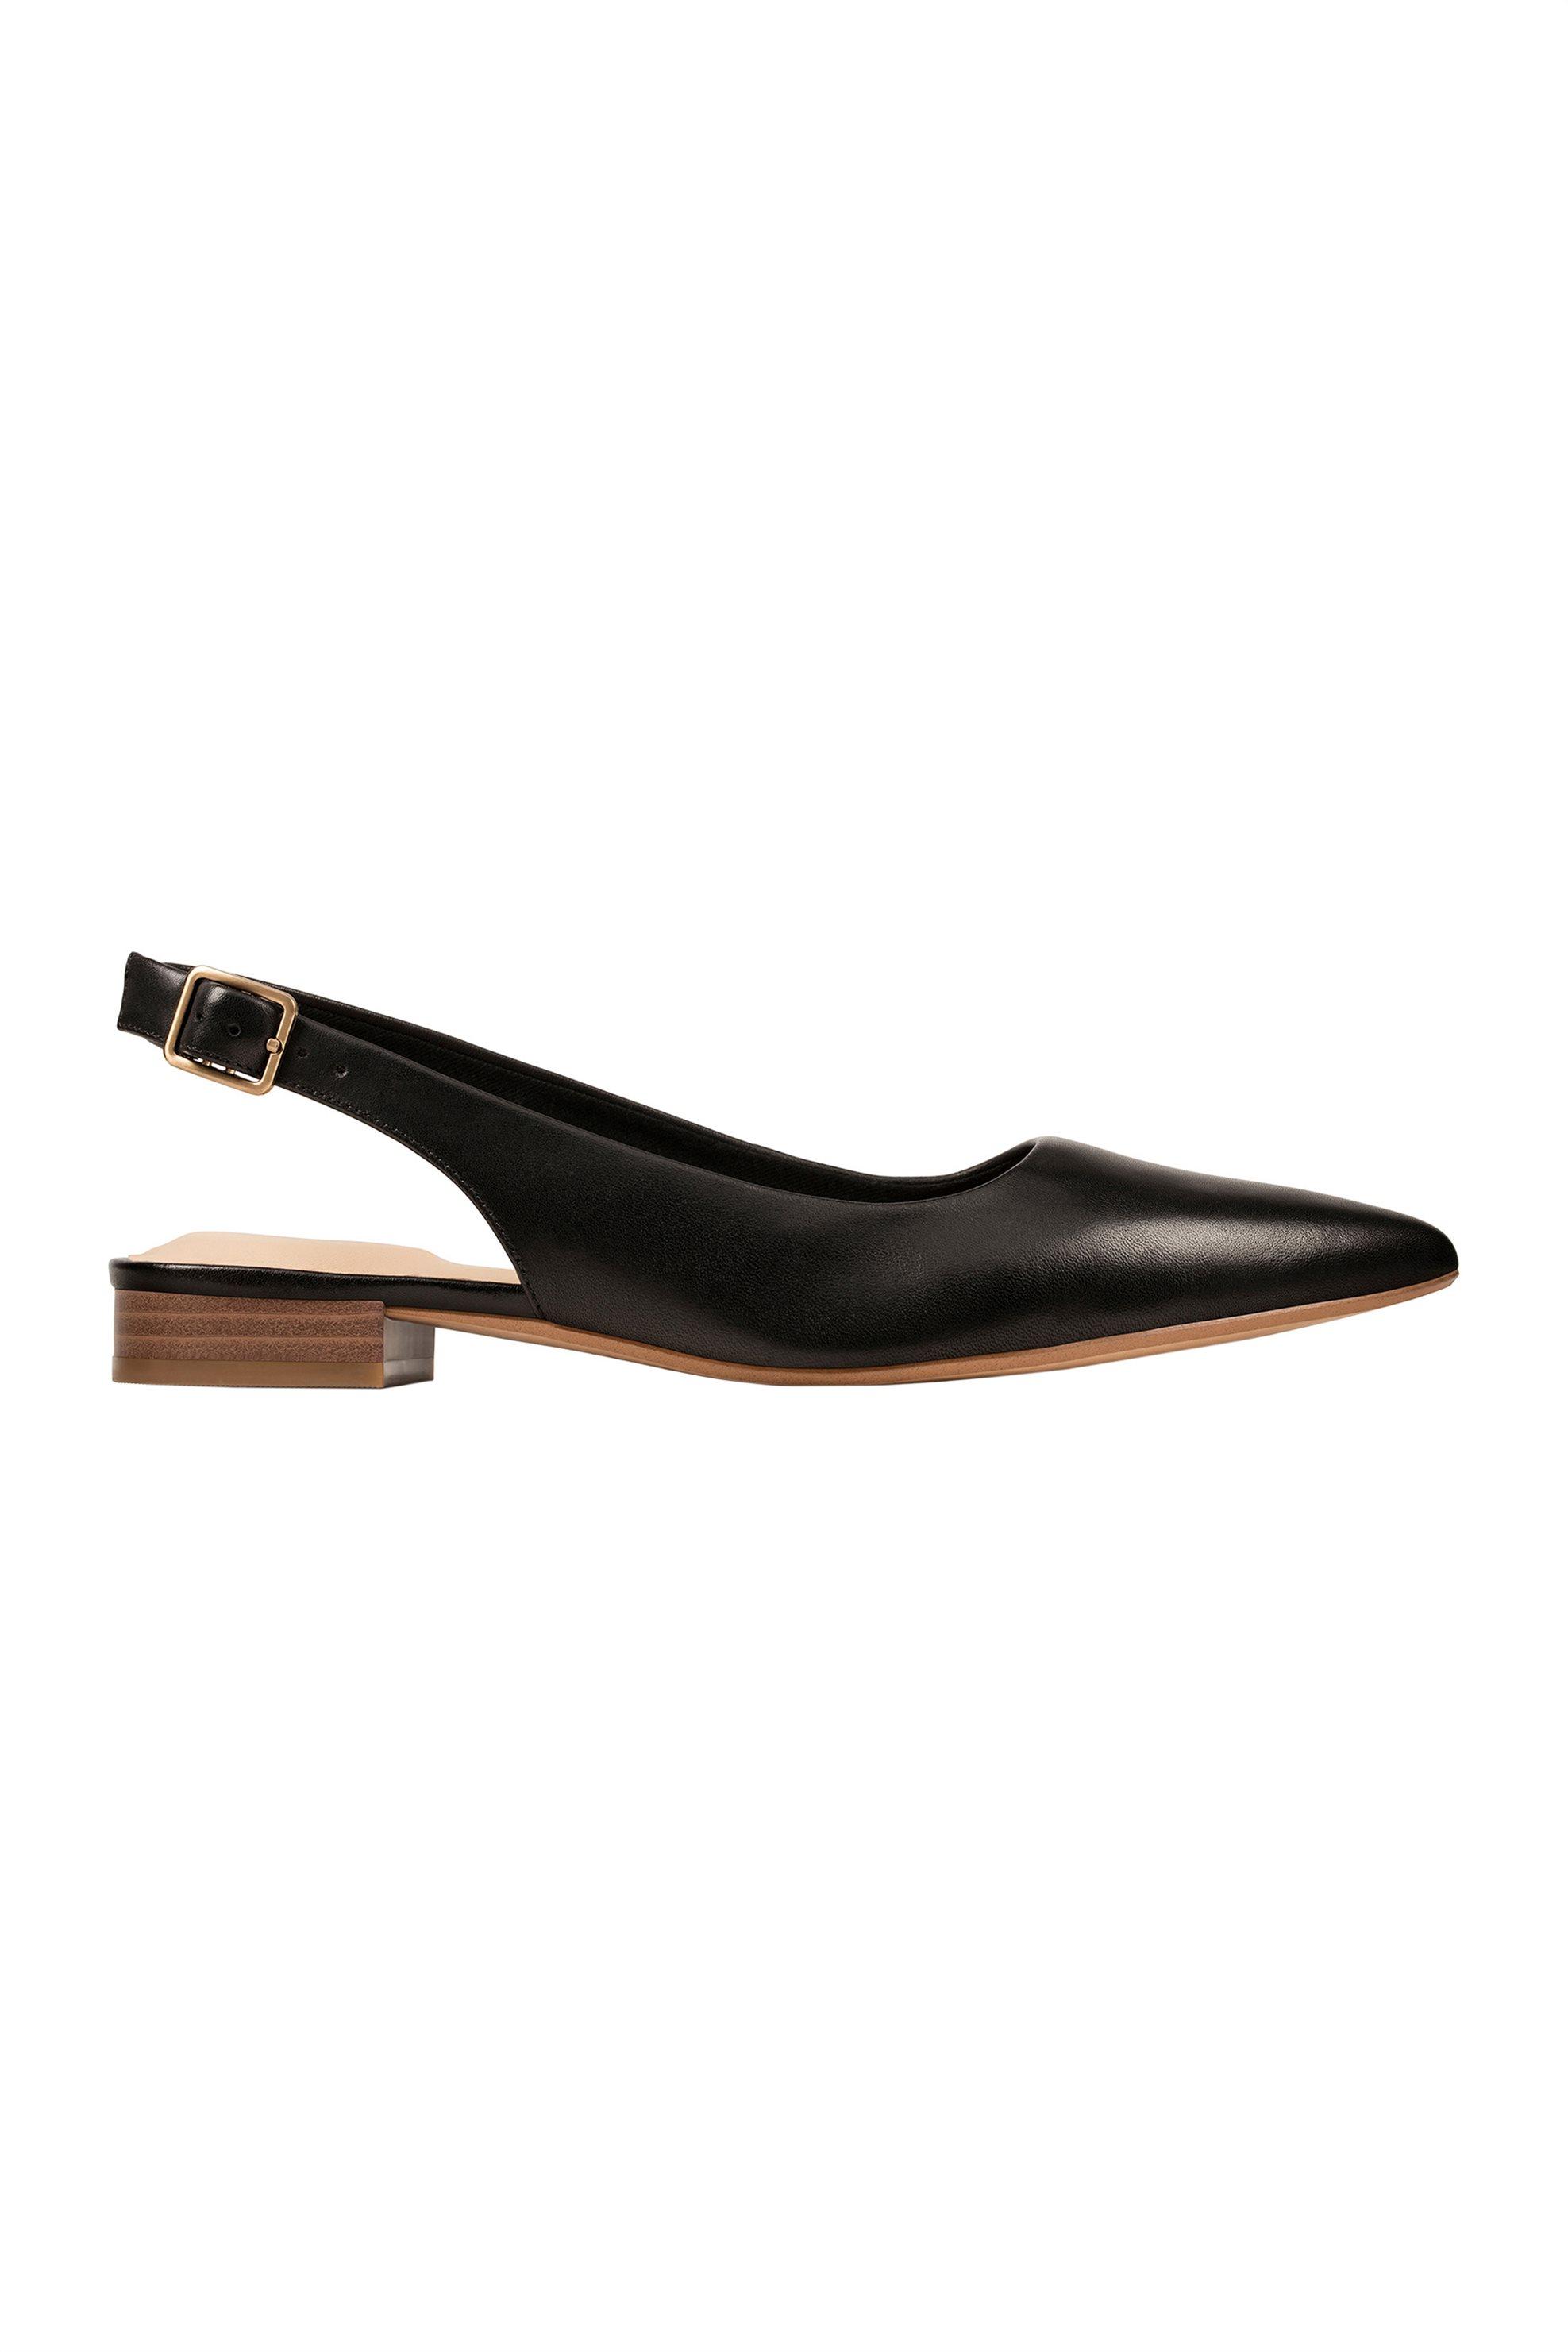 "Clarks γυναικεία παπούτσια slingback ""Laina 15"" – 26148860 – Μαύρο"